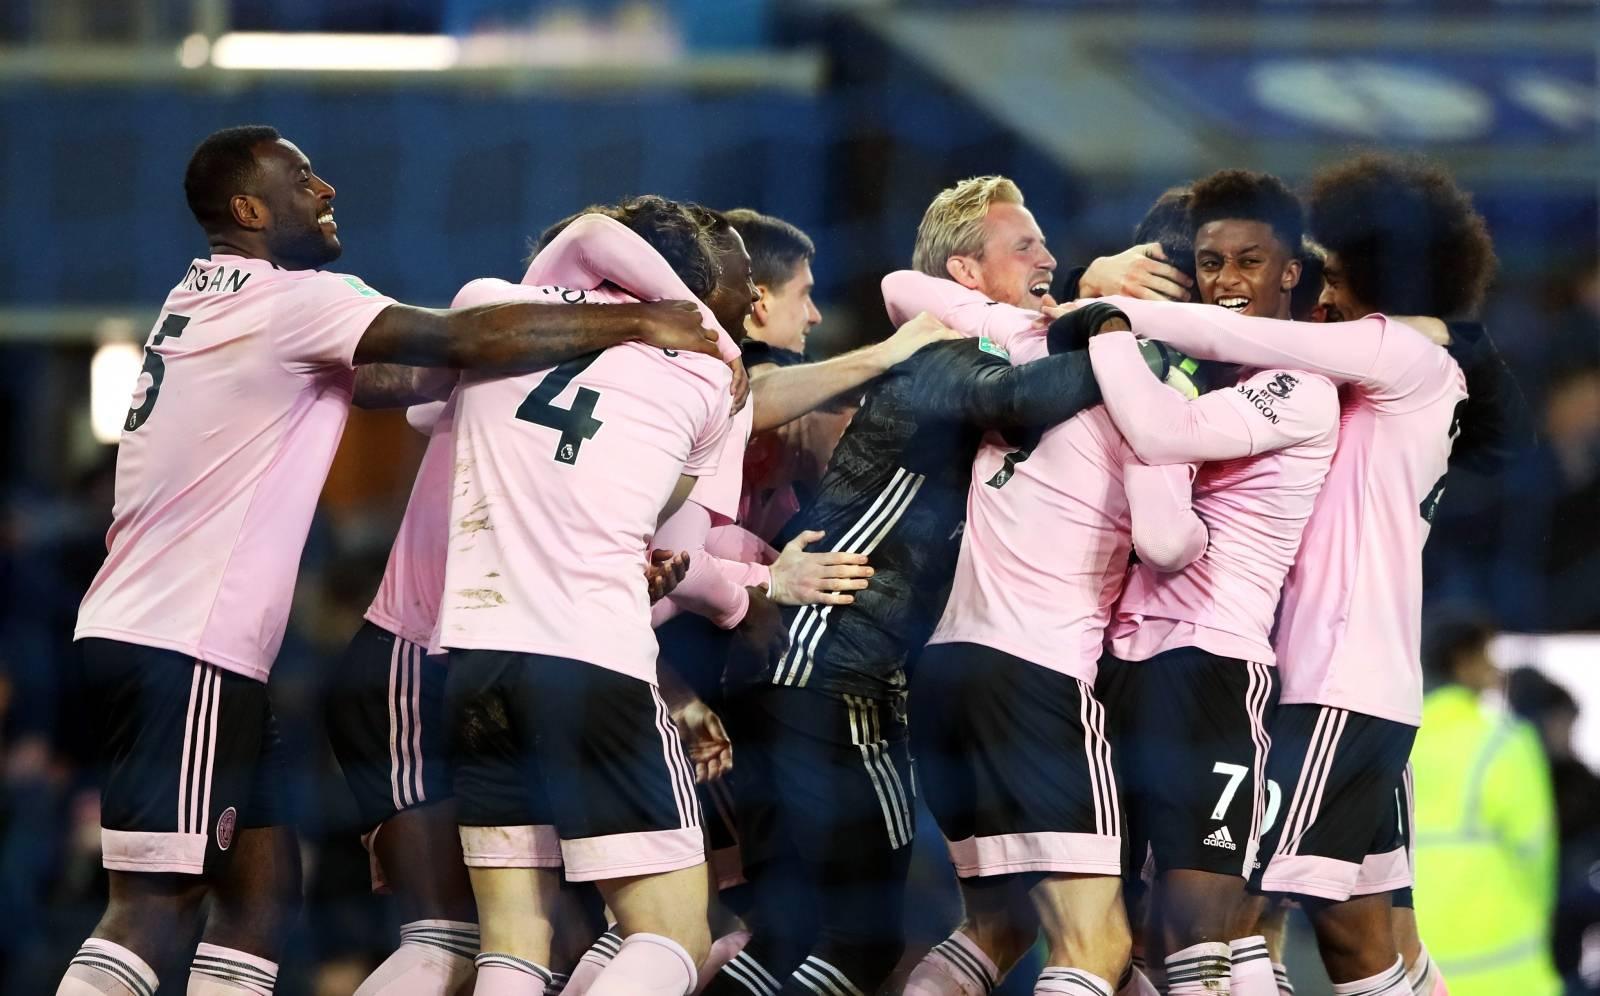 Everton v Leicester City - Carabao Cup - Quarter Final - Goodison Park